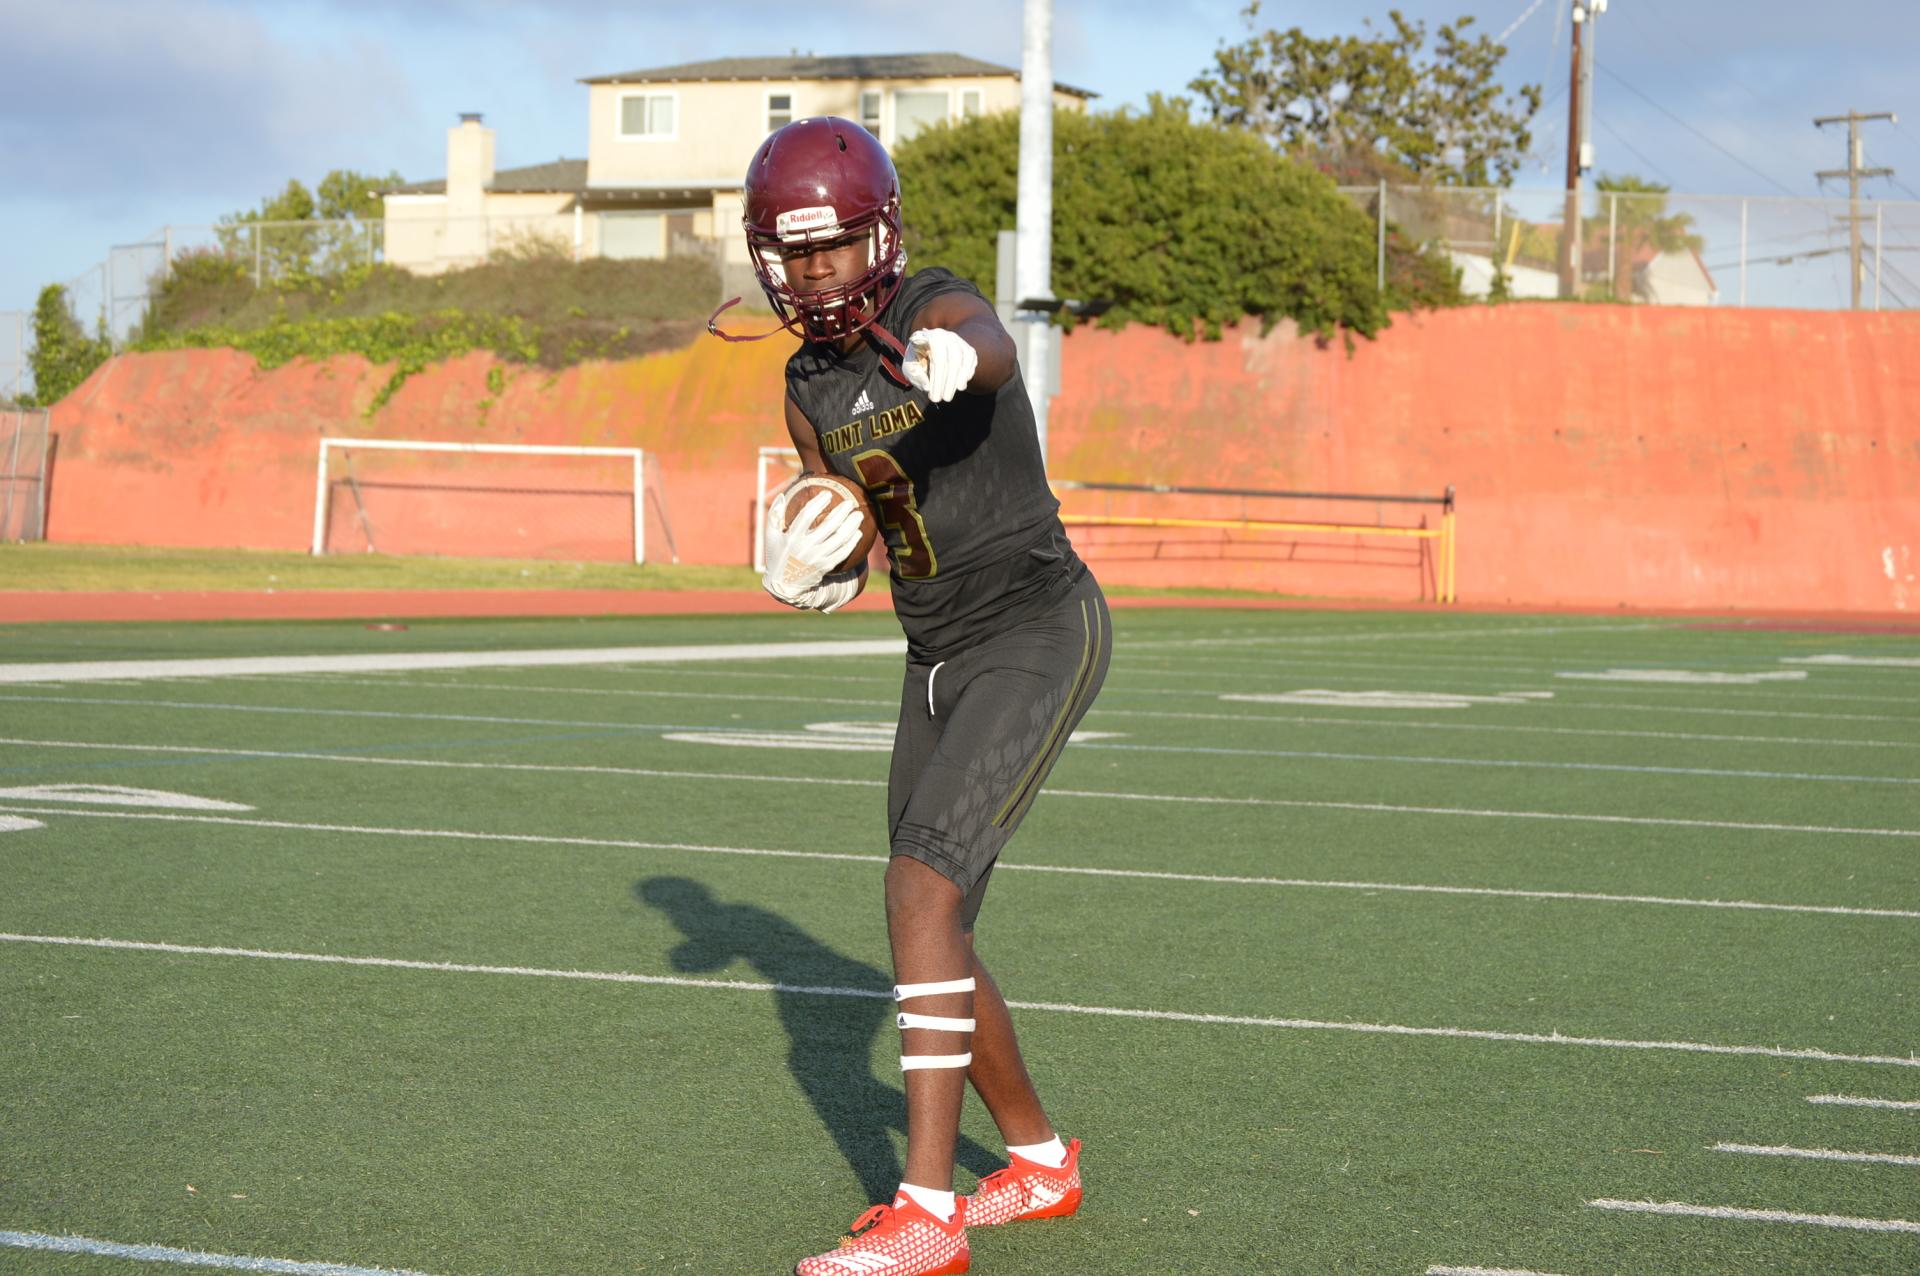 Point Loma High School - JL Skinner